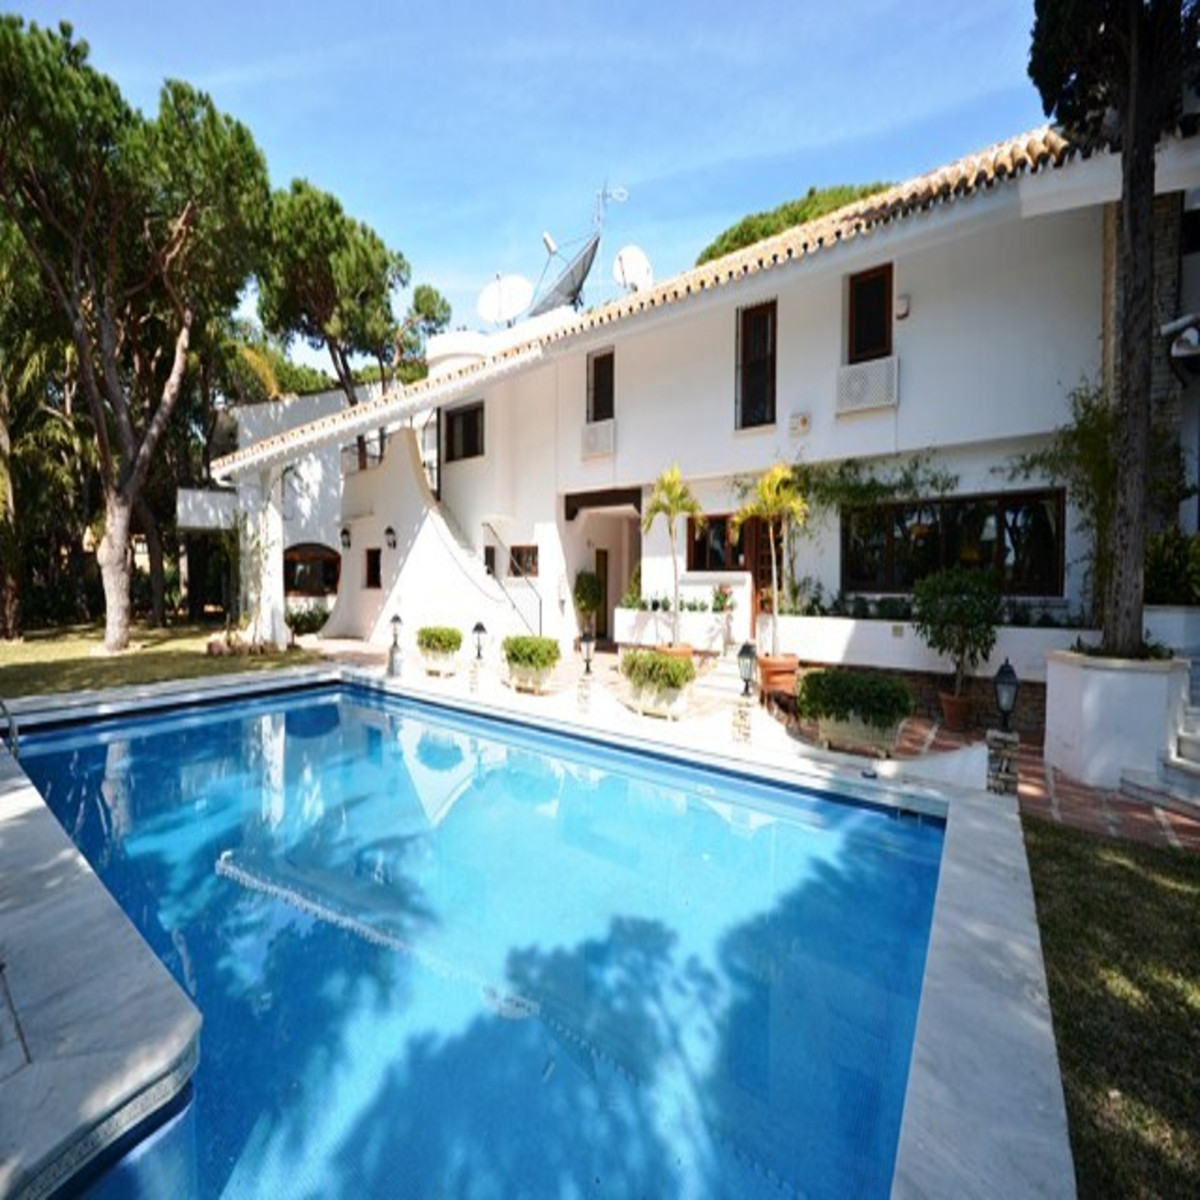 Detached Villa for sale in Cabopino R3874144